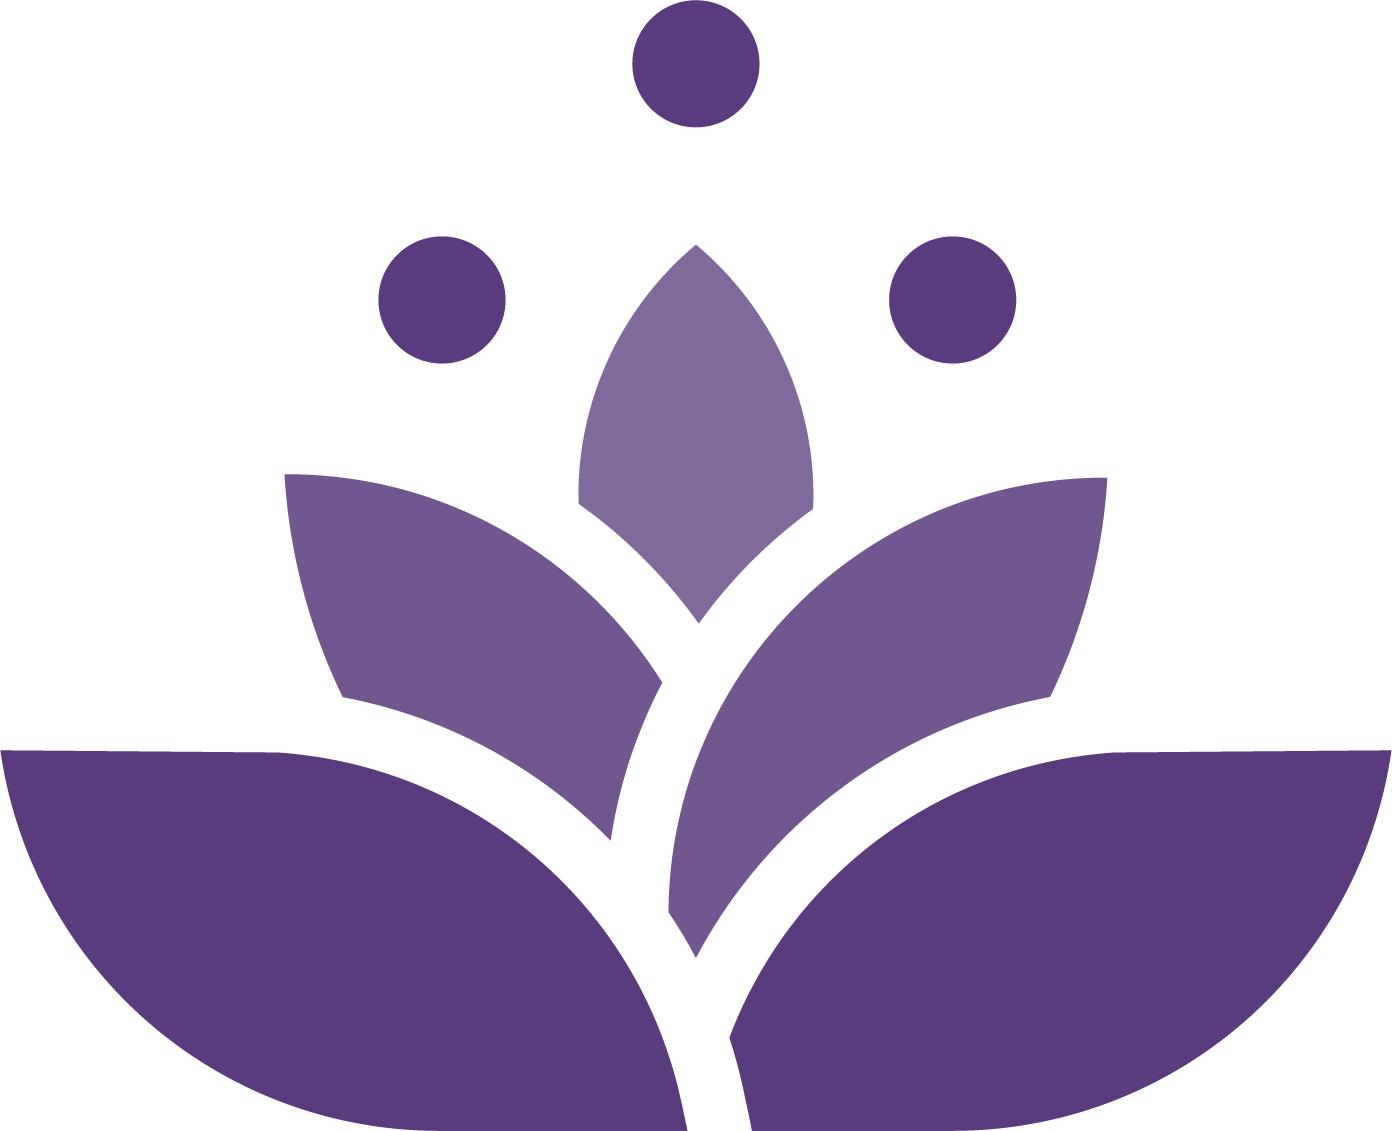 Epimedium - Zmiany godzin otwarcia Epimedium